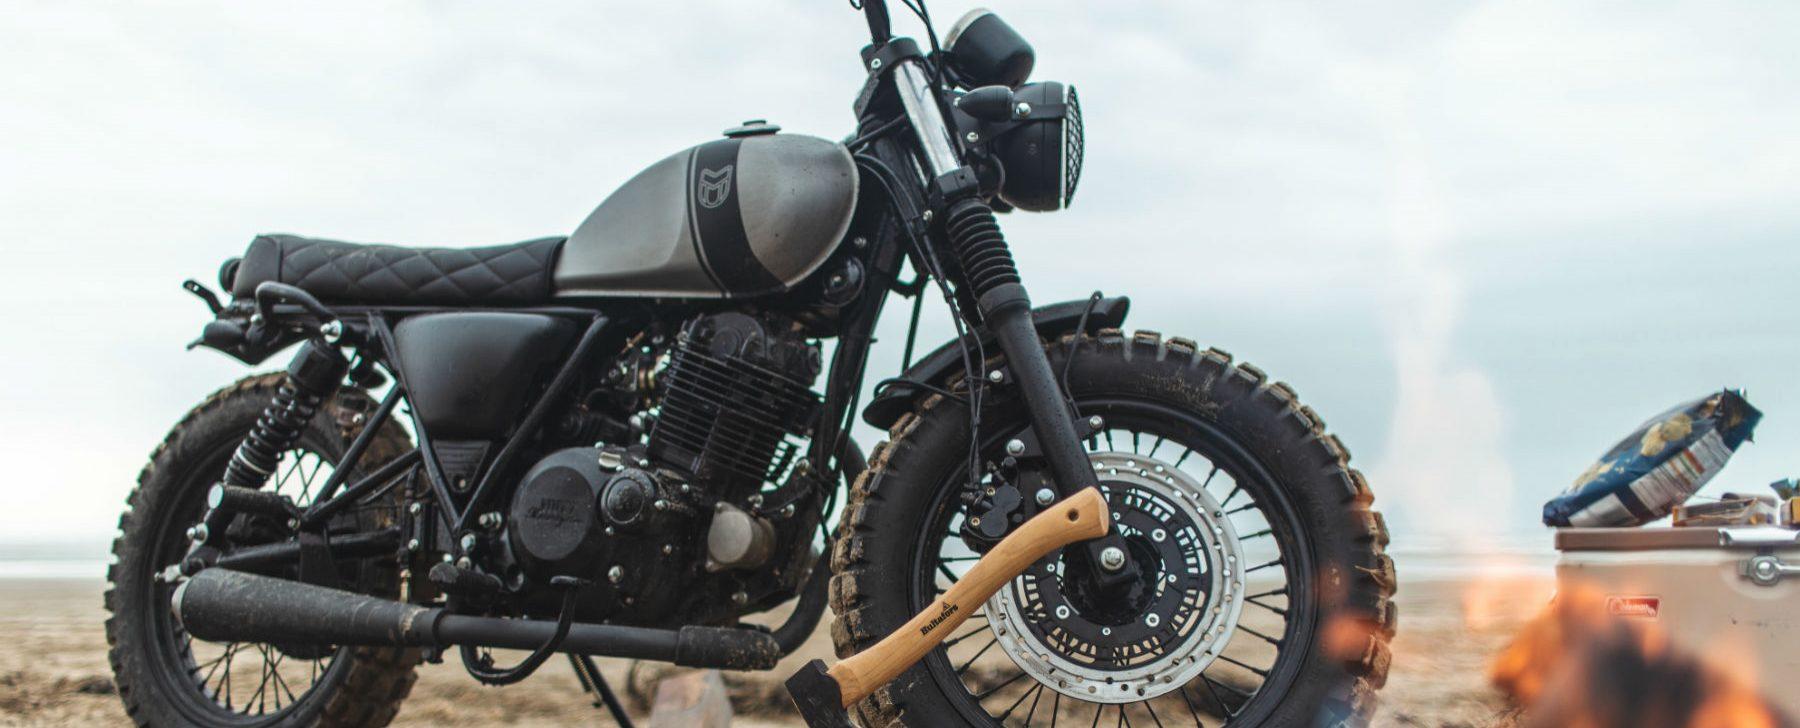 Mutt Motorcycles